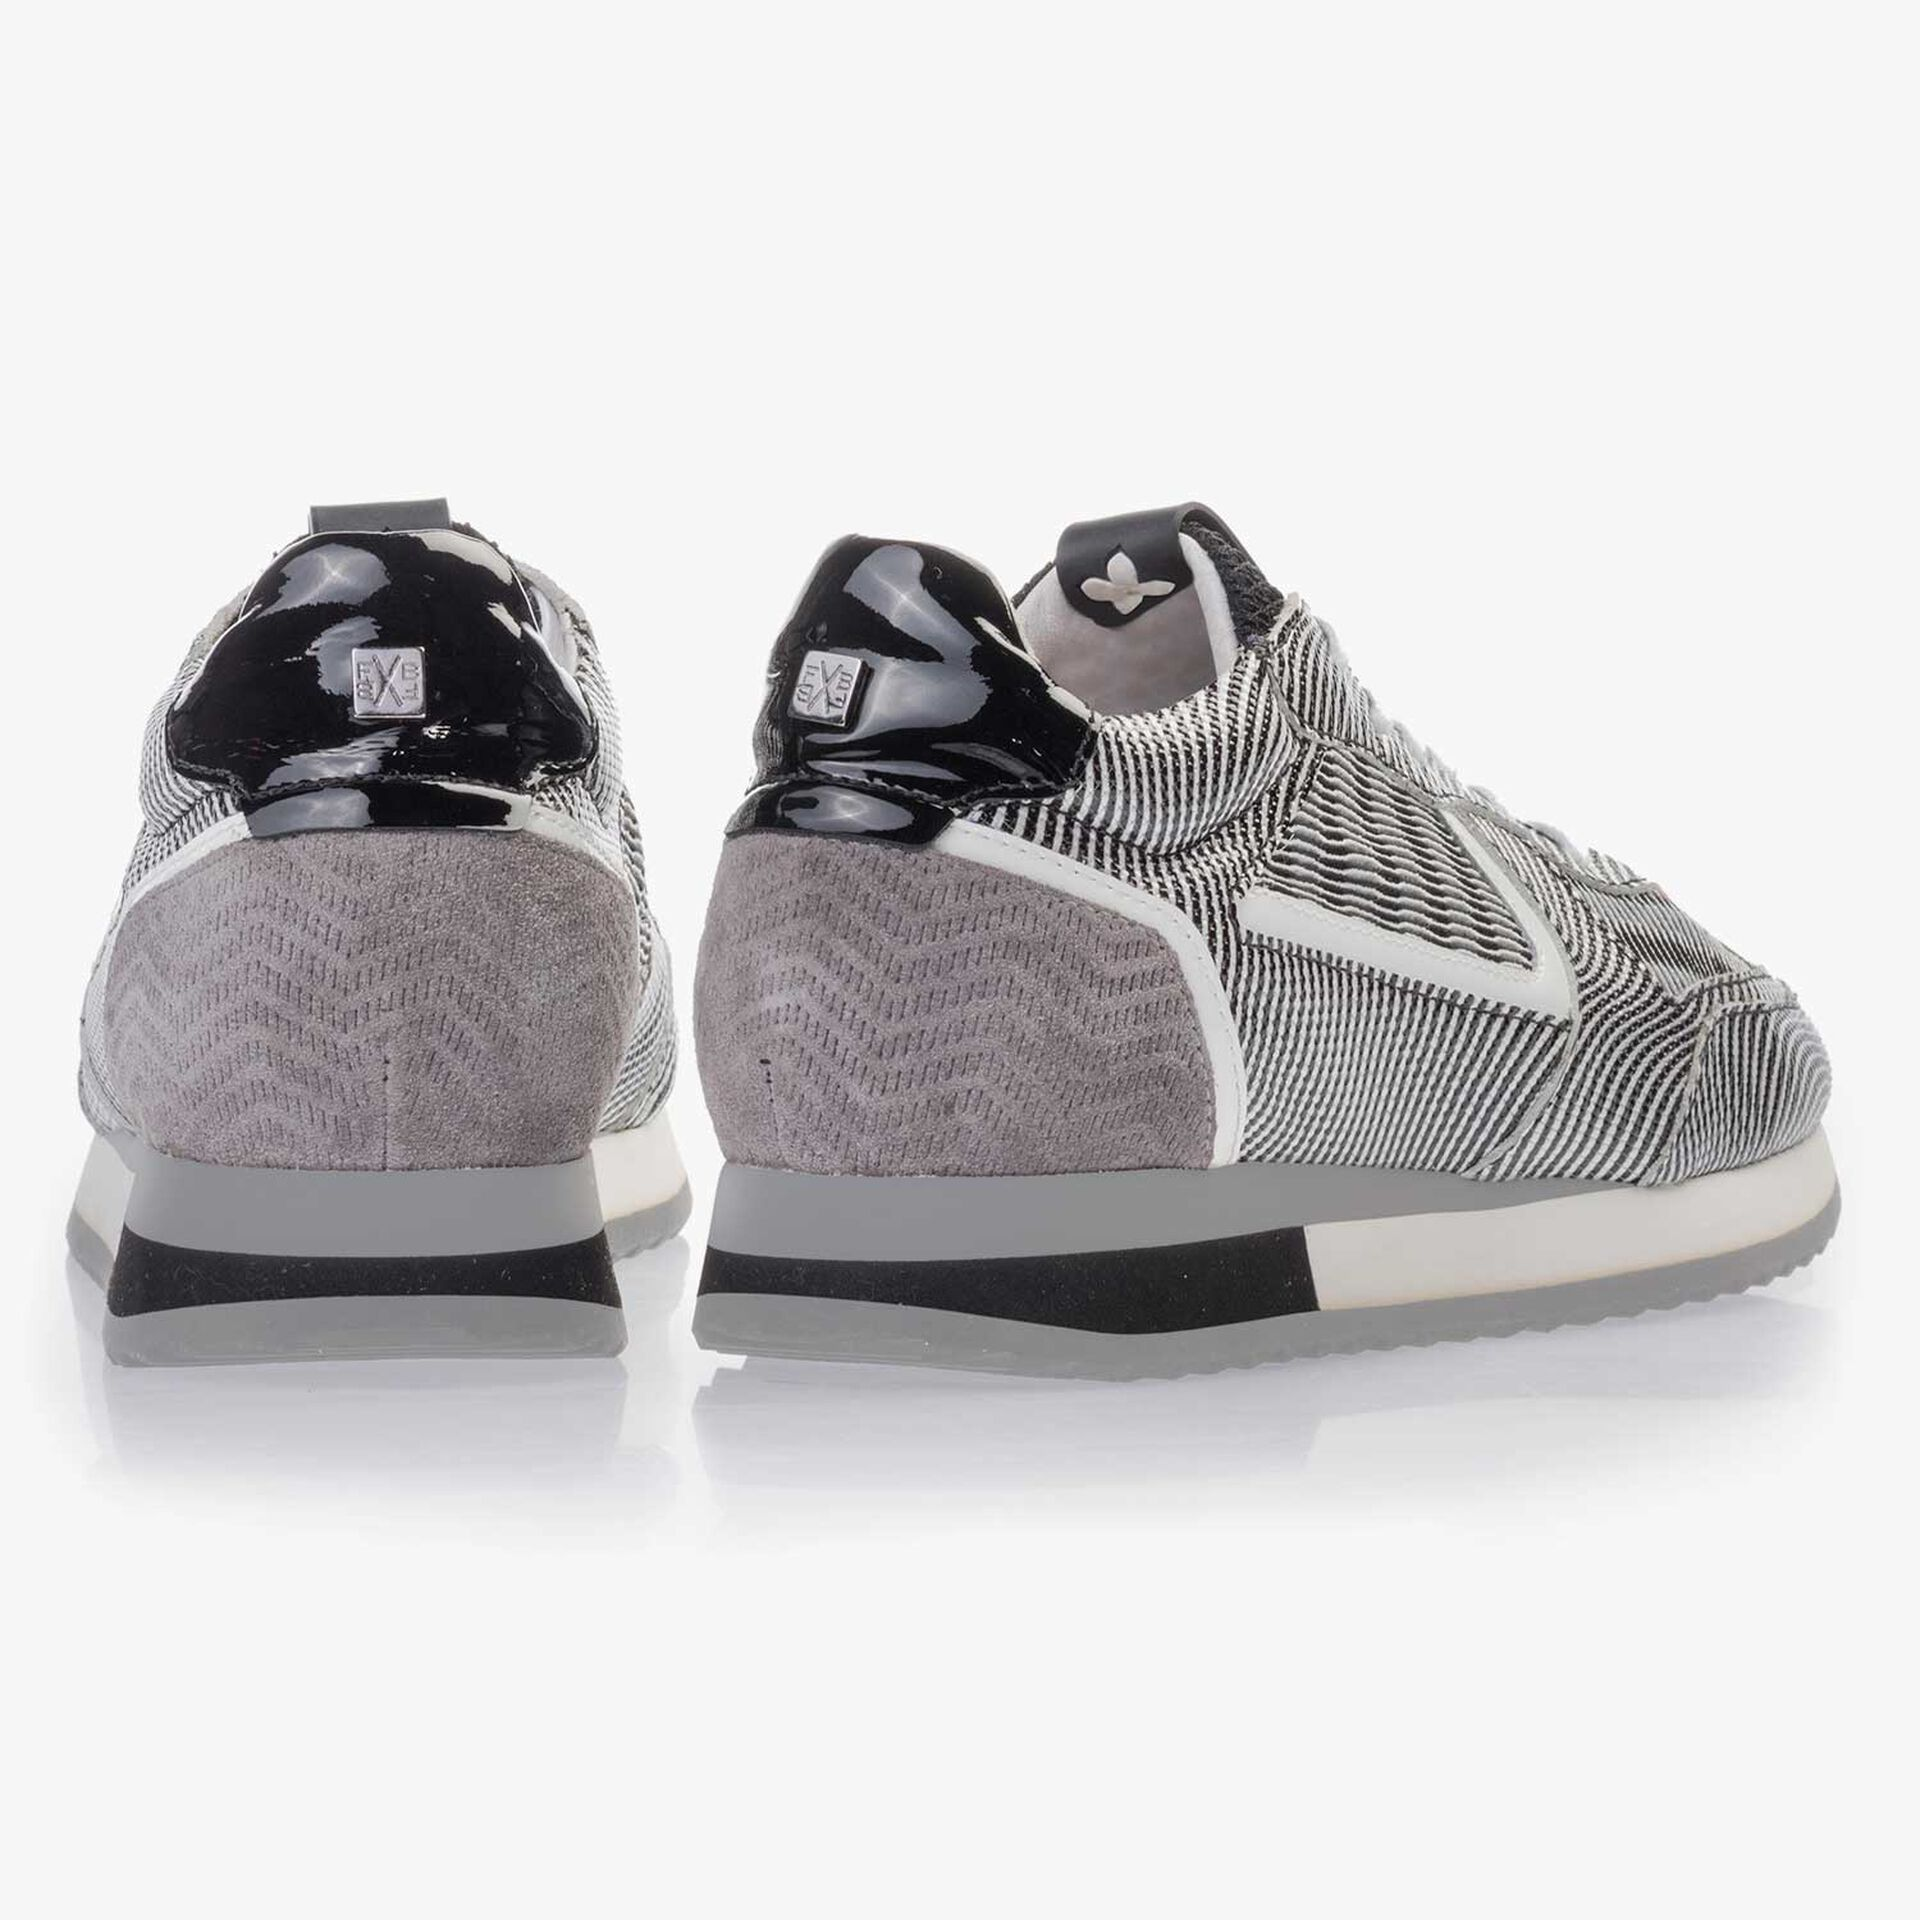 Black/white patent leather sneaker